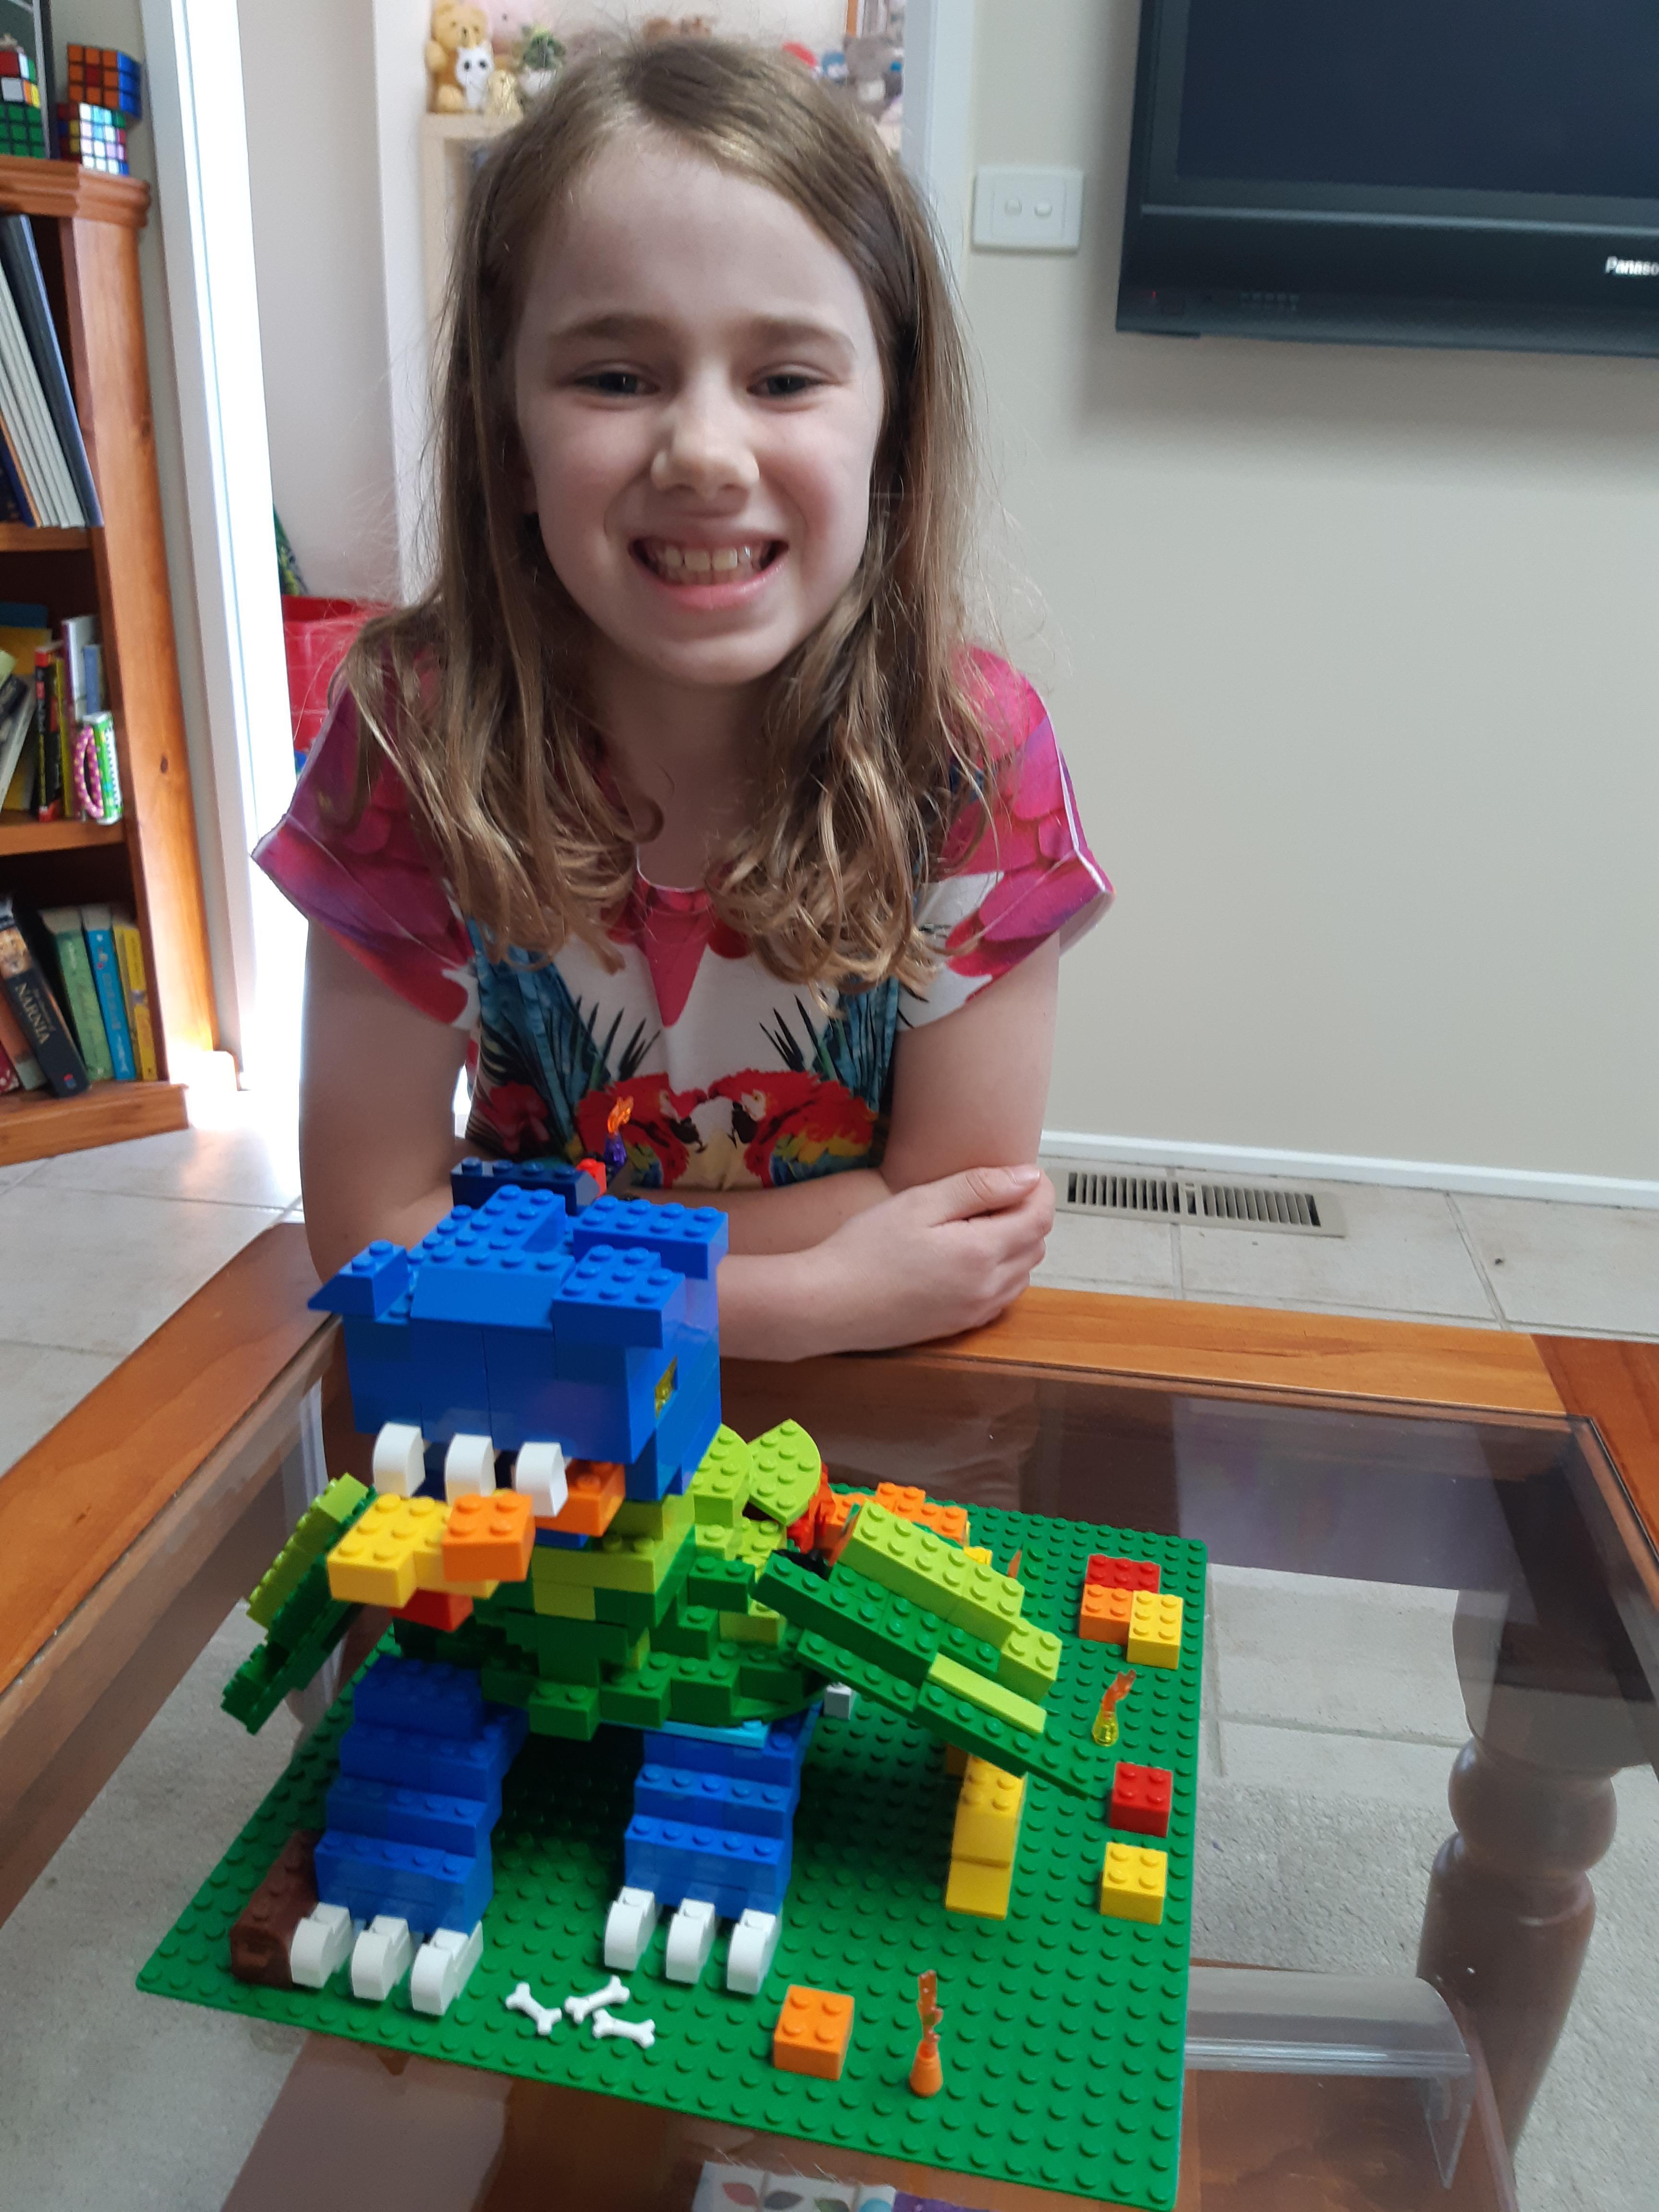 Laura Lego